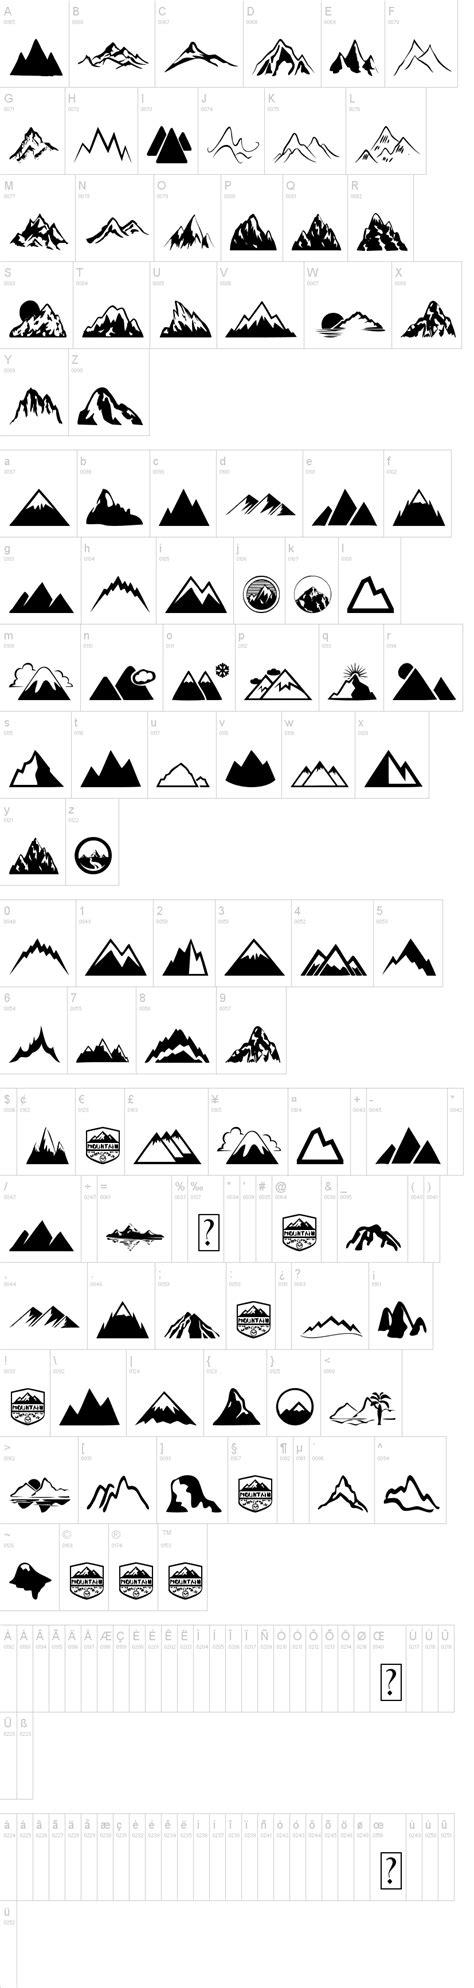 fire on the mountain font dafont com mountain font dafont com